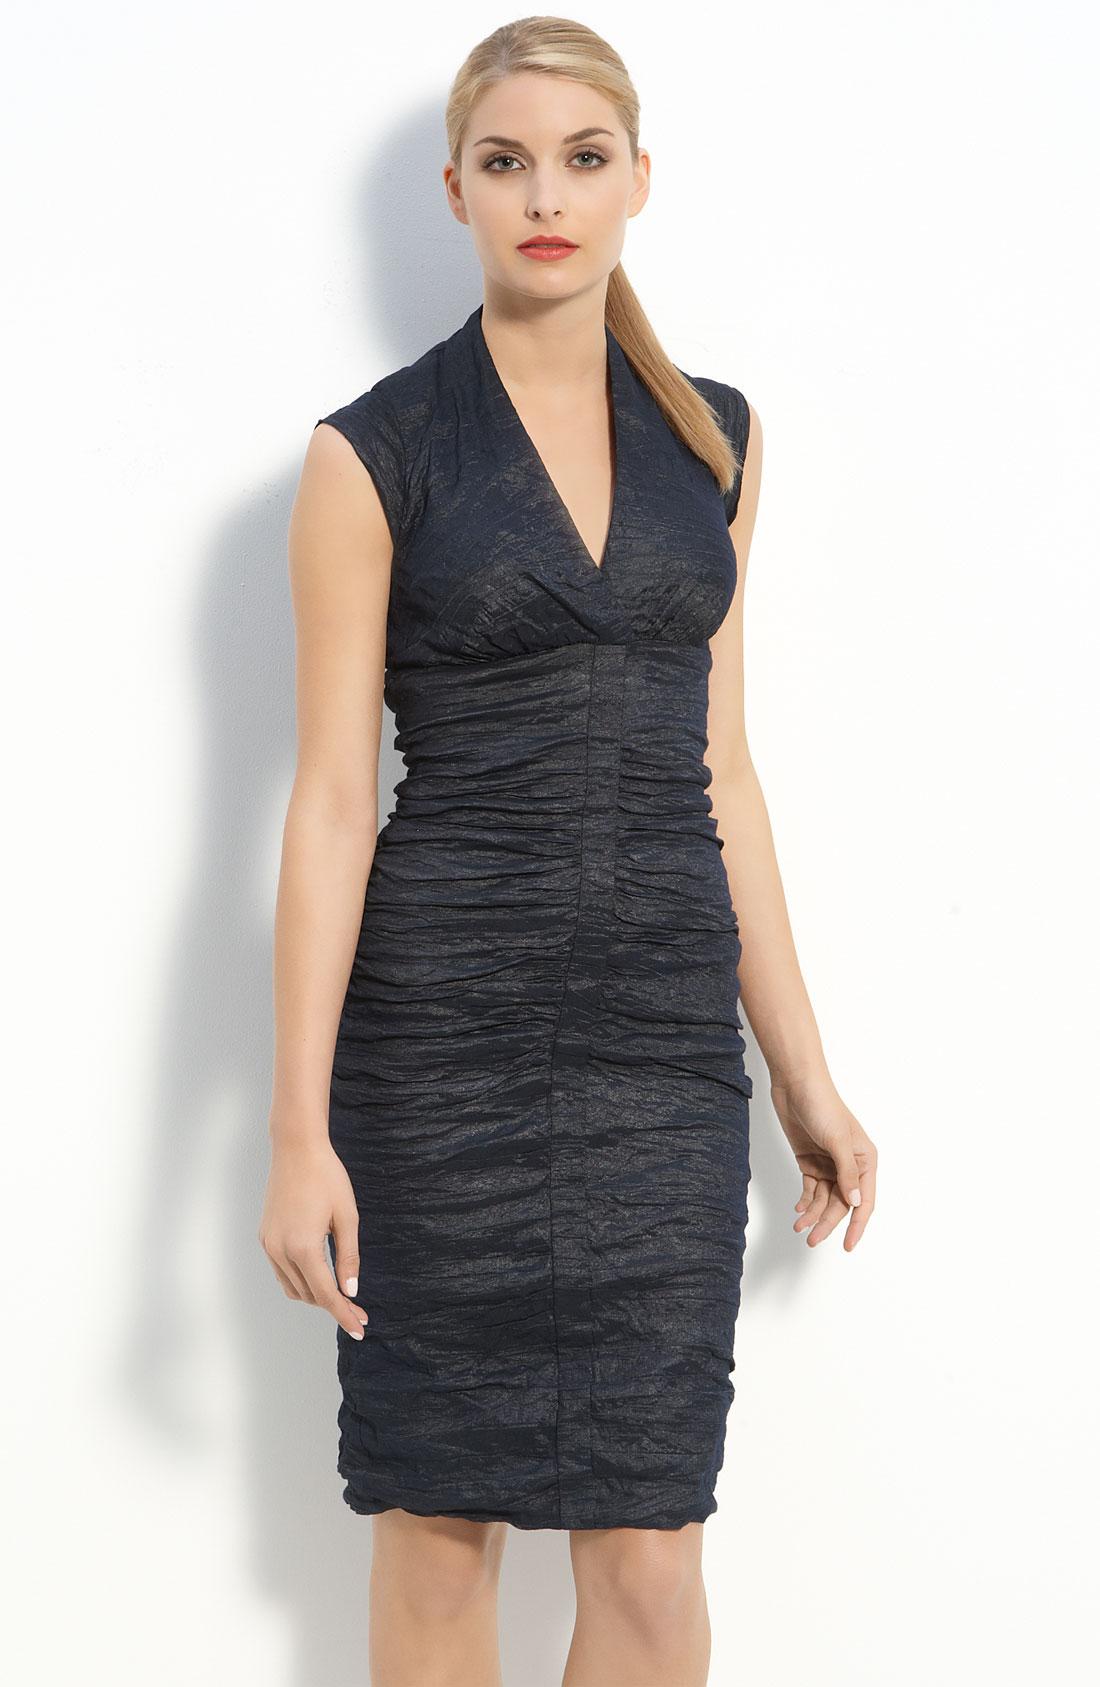 Nicole Miller Evening Dress  Cocktail Dresses 2016